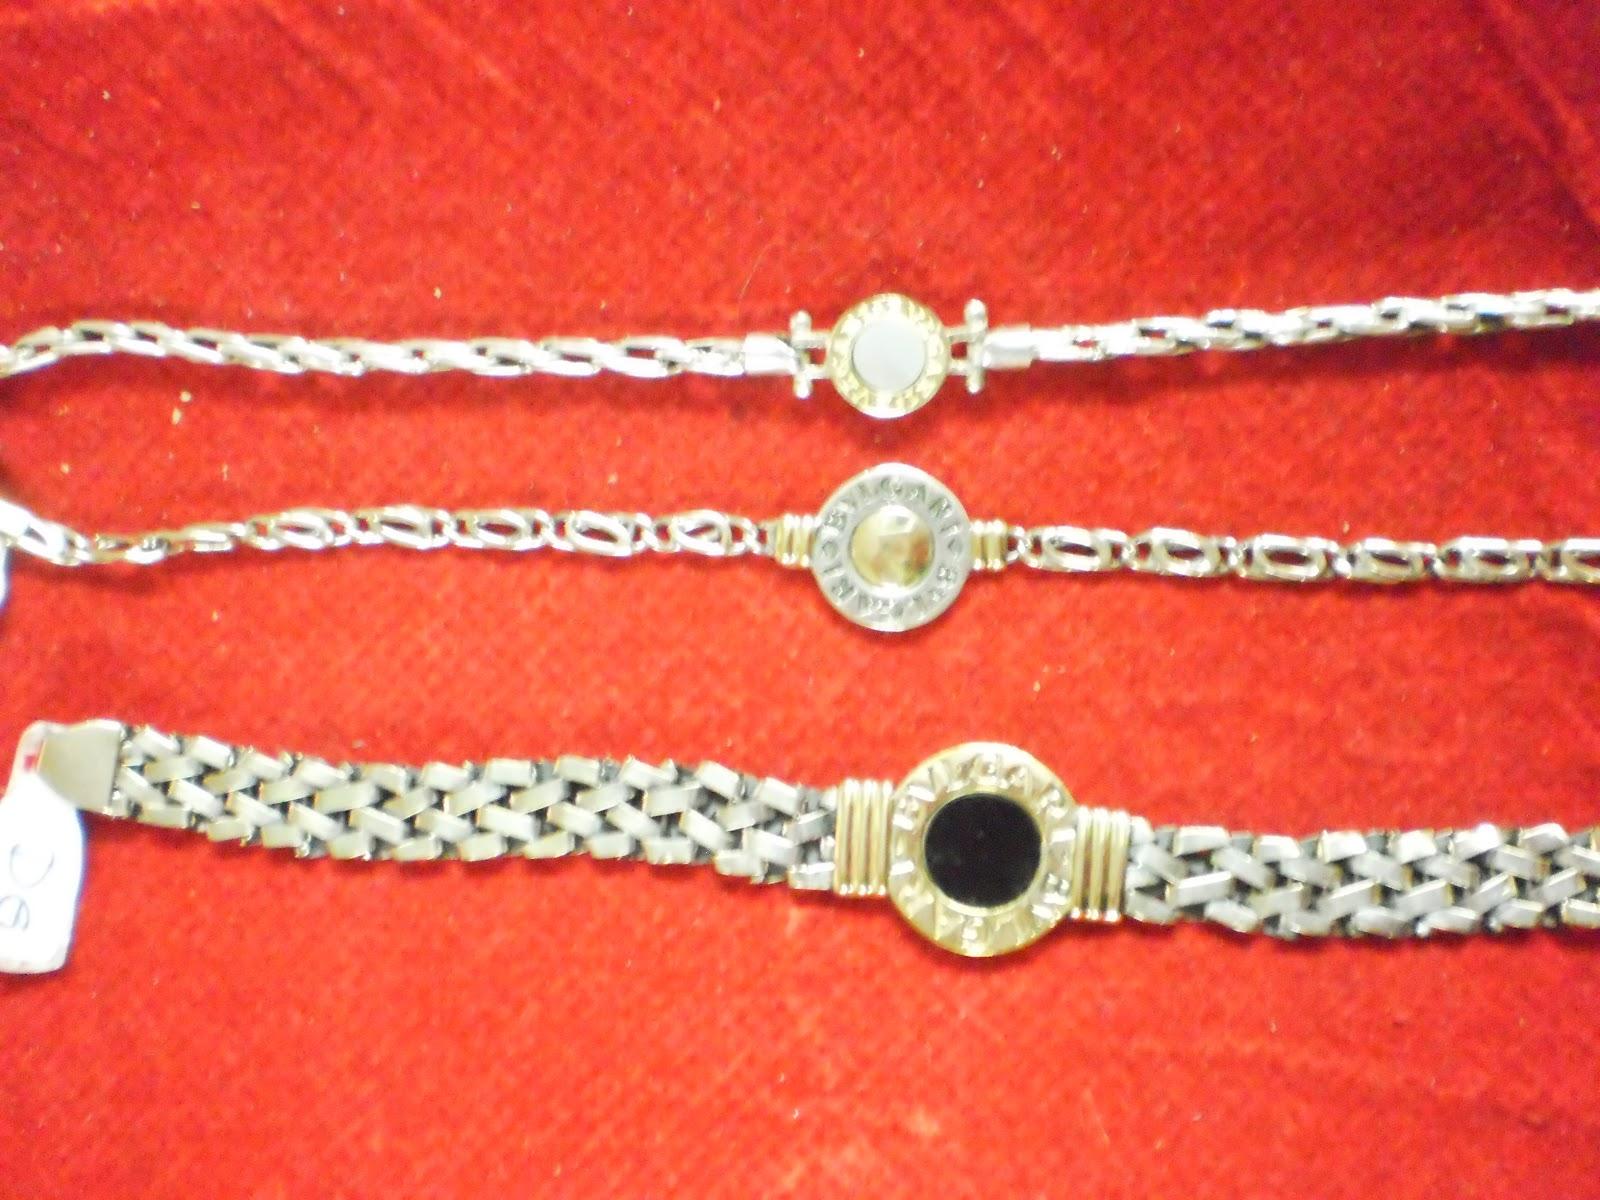 127976cbacf7 Aghata joyas  Pulsera plata y oro Bvlgari diferentes formas